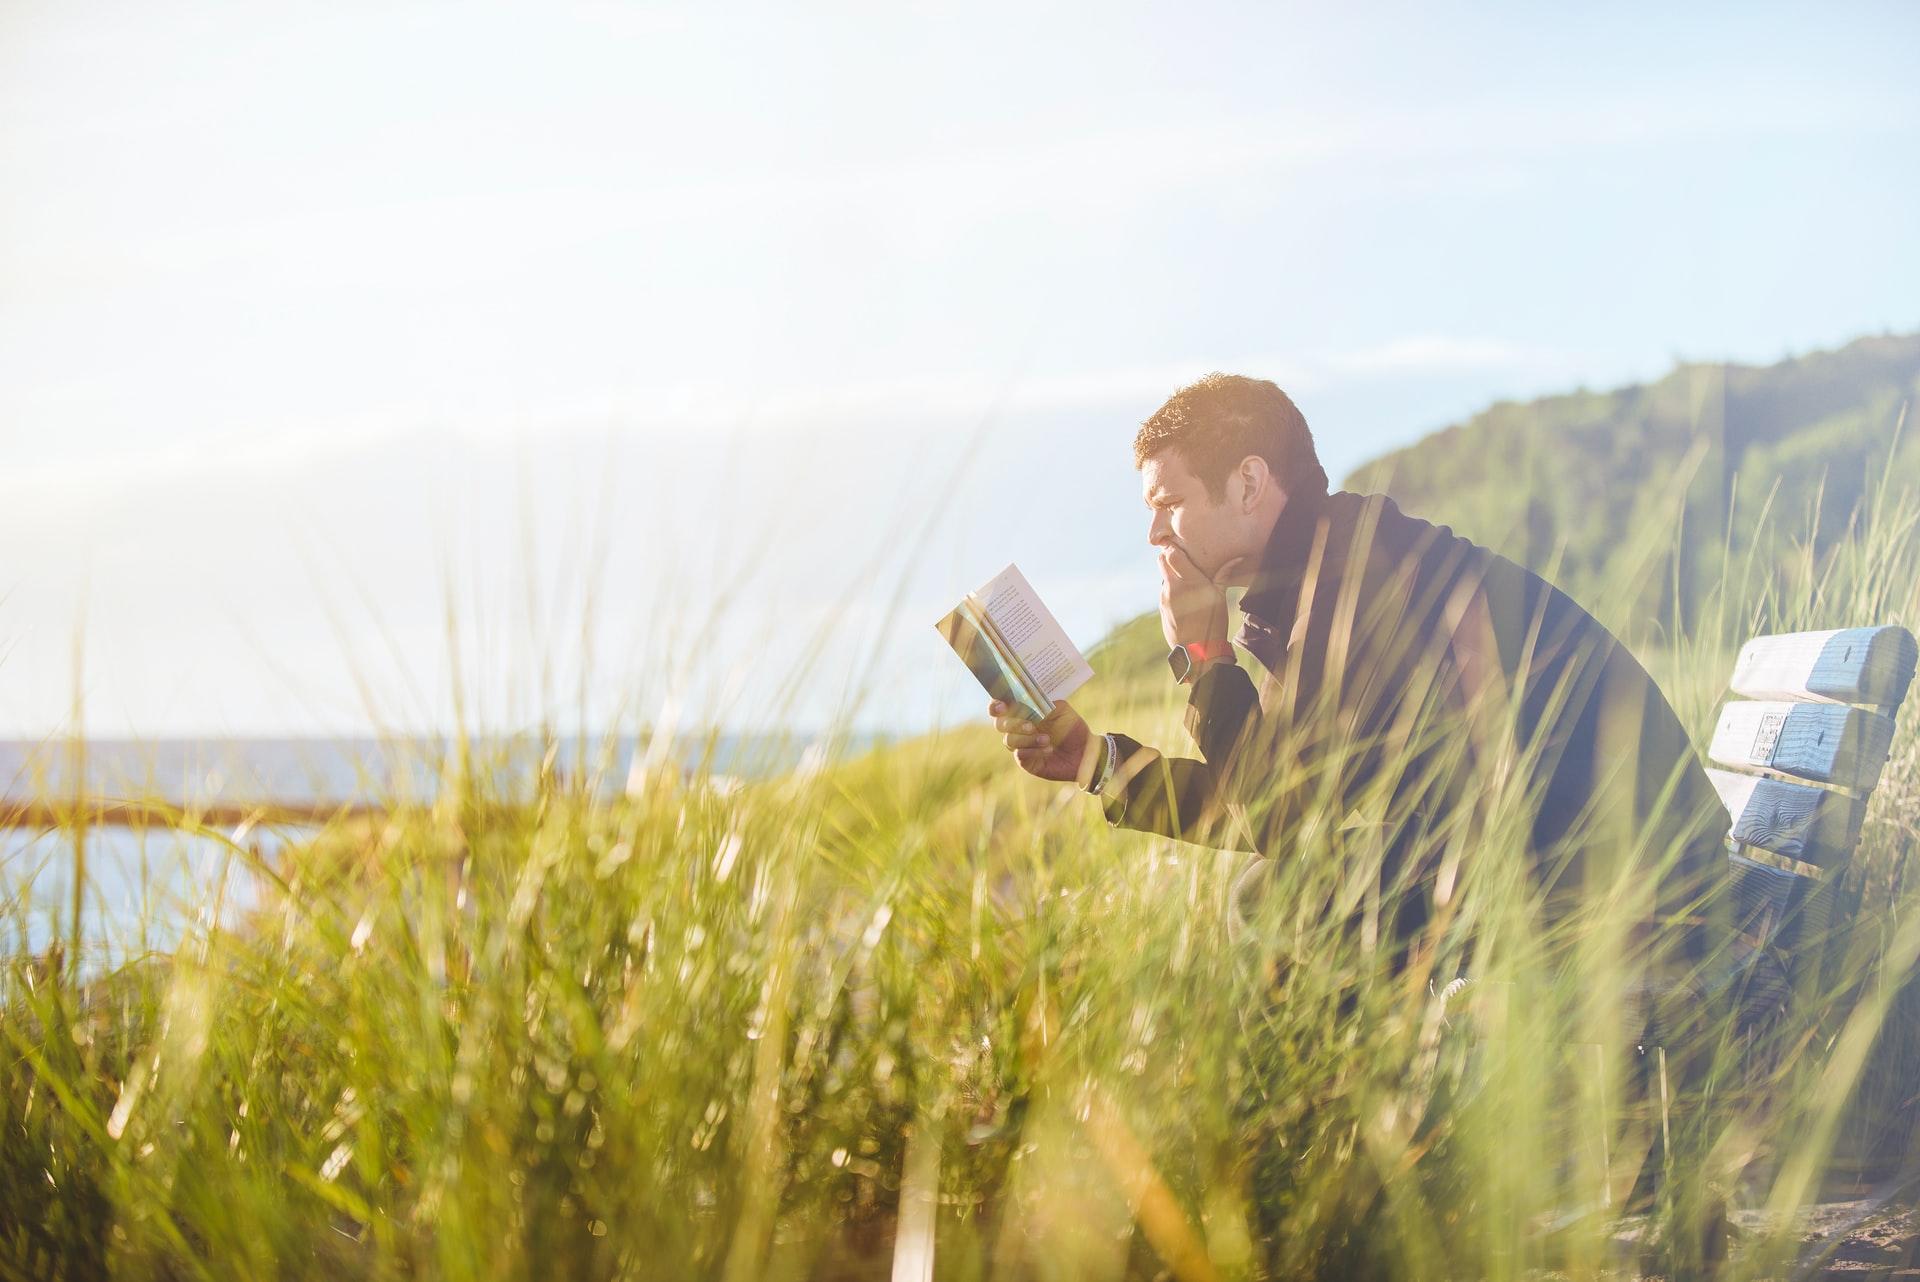 5 Books to Escape With